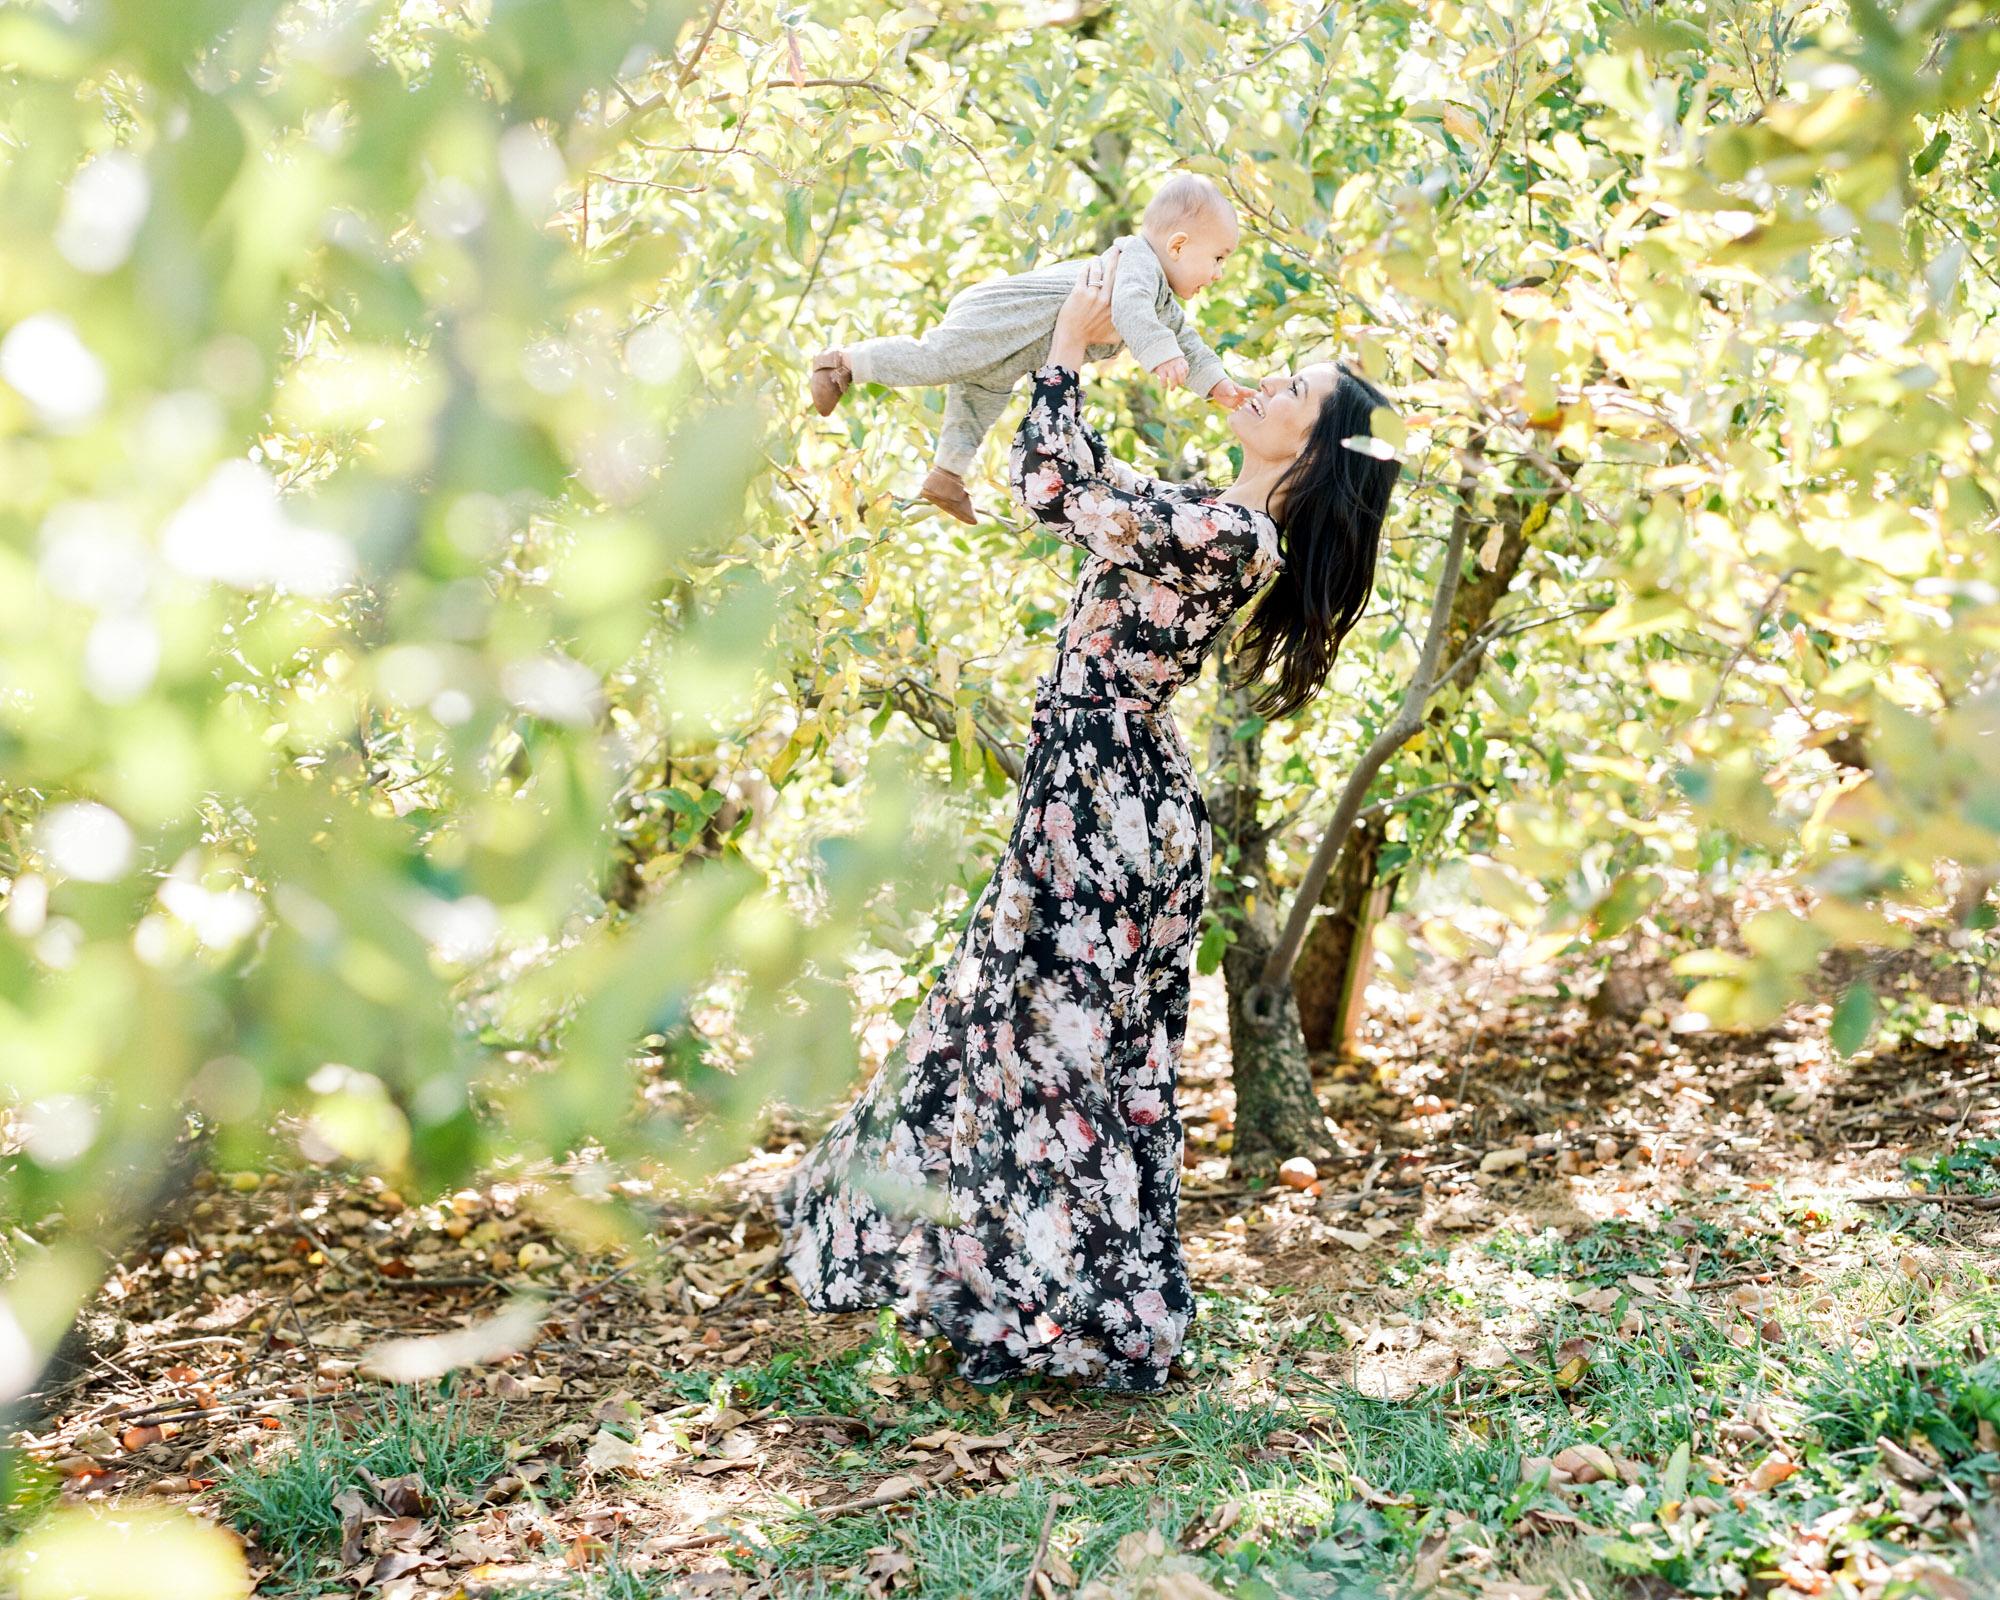 Charlottesville_Charlotte_North_Carolina_Richmond_Virginia_Family_Wedding_Film_Photographer-11.jpg